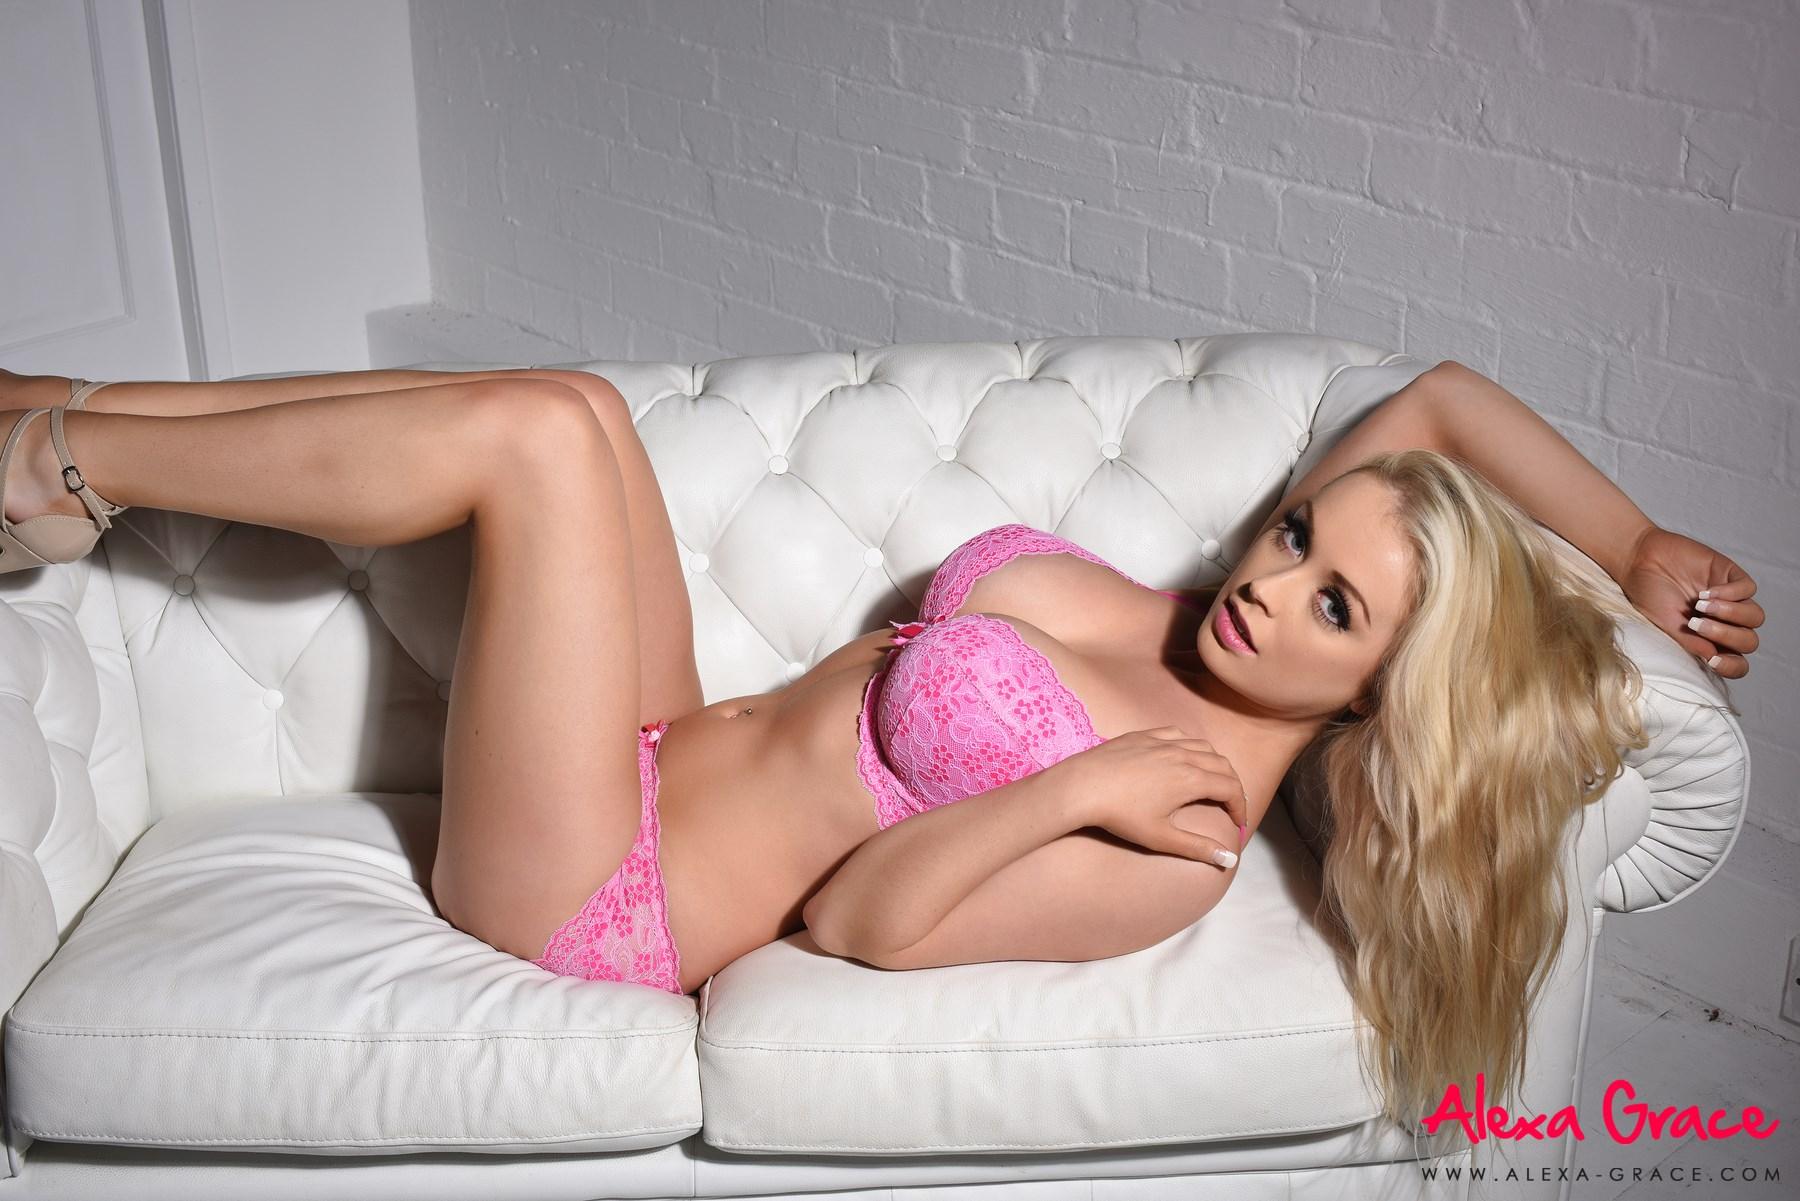 Melissa debling naked